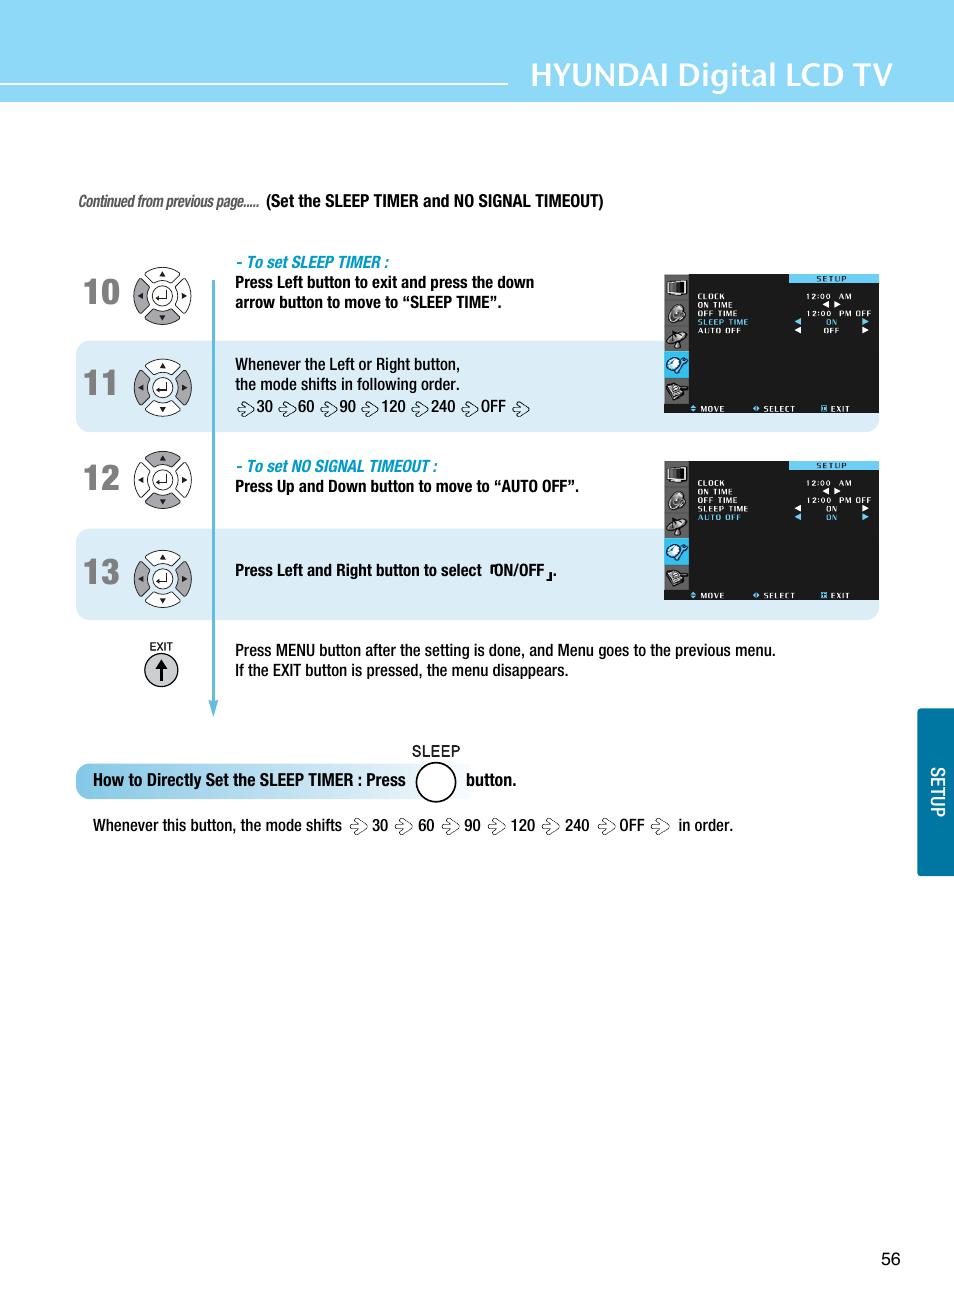 hyundai n700e instruction manual Array - hyundai digital lcd tv hyundai  imagequest q321 user manual page rh manualsdir com